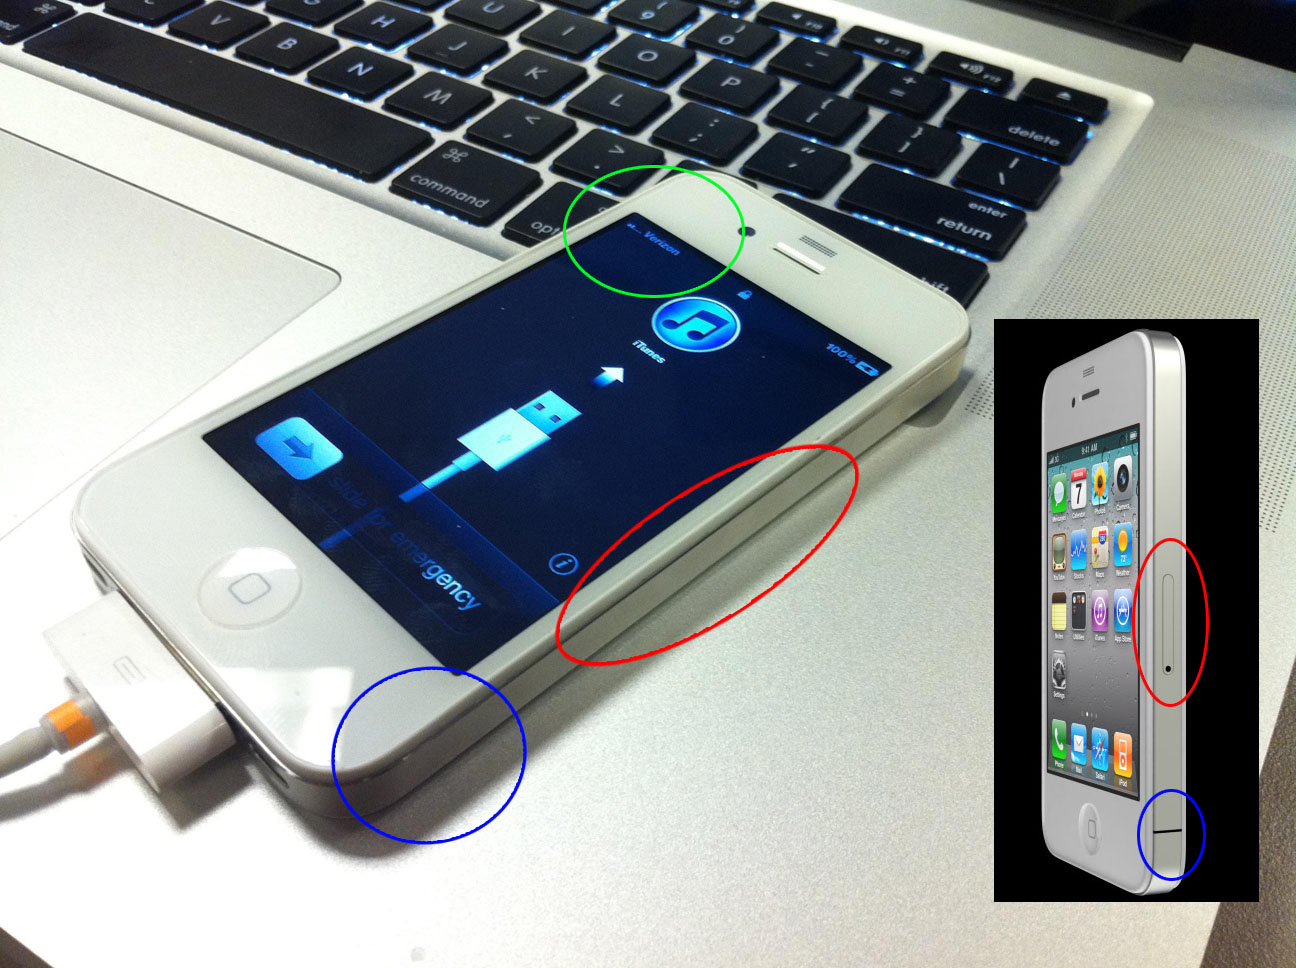 how to unlock iphone 4s sim card slot casino fontaine sur saone rh oxymel cf Apple iPhone 12 iPhone Manual Names